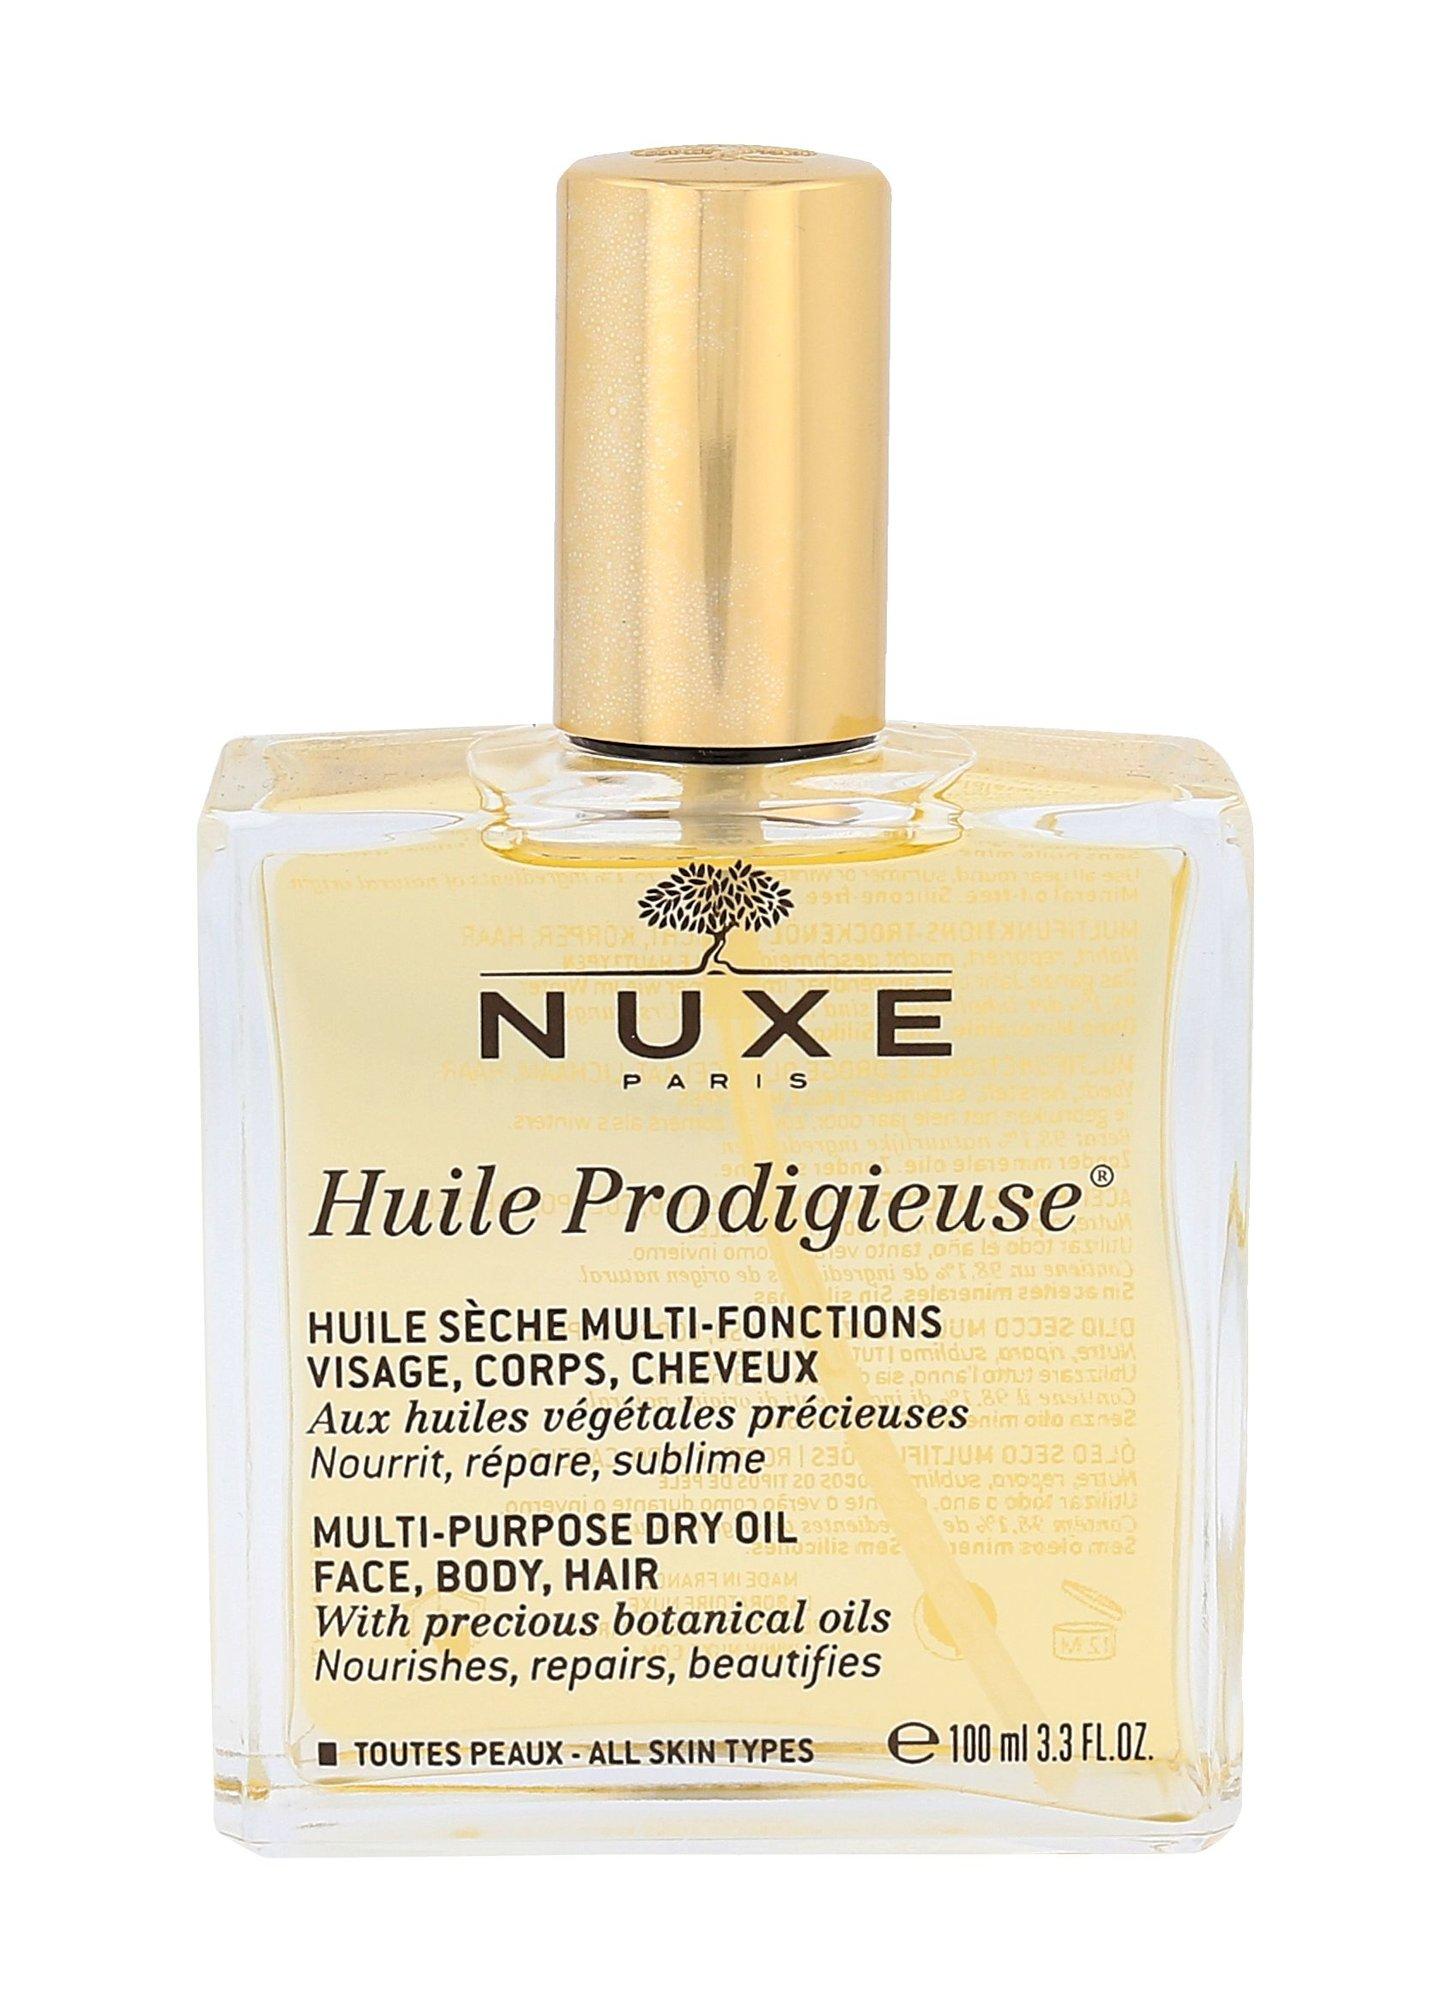 Nuxe Prodigieuse Multi-Purpose Dry Oil Cosmetic 100ml